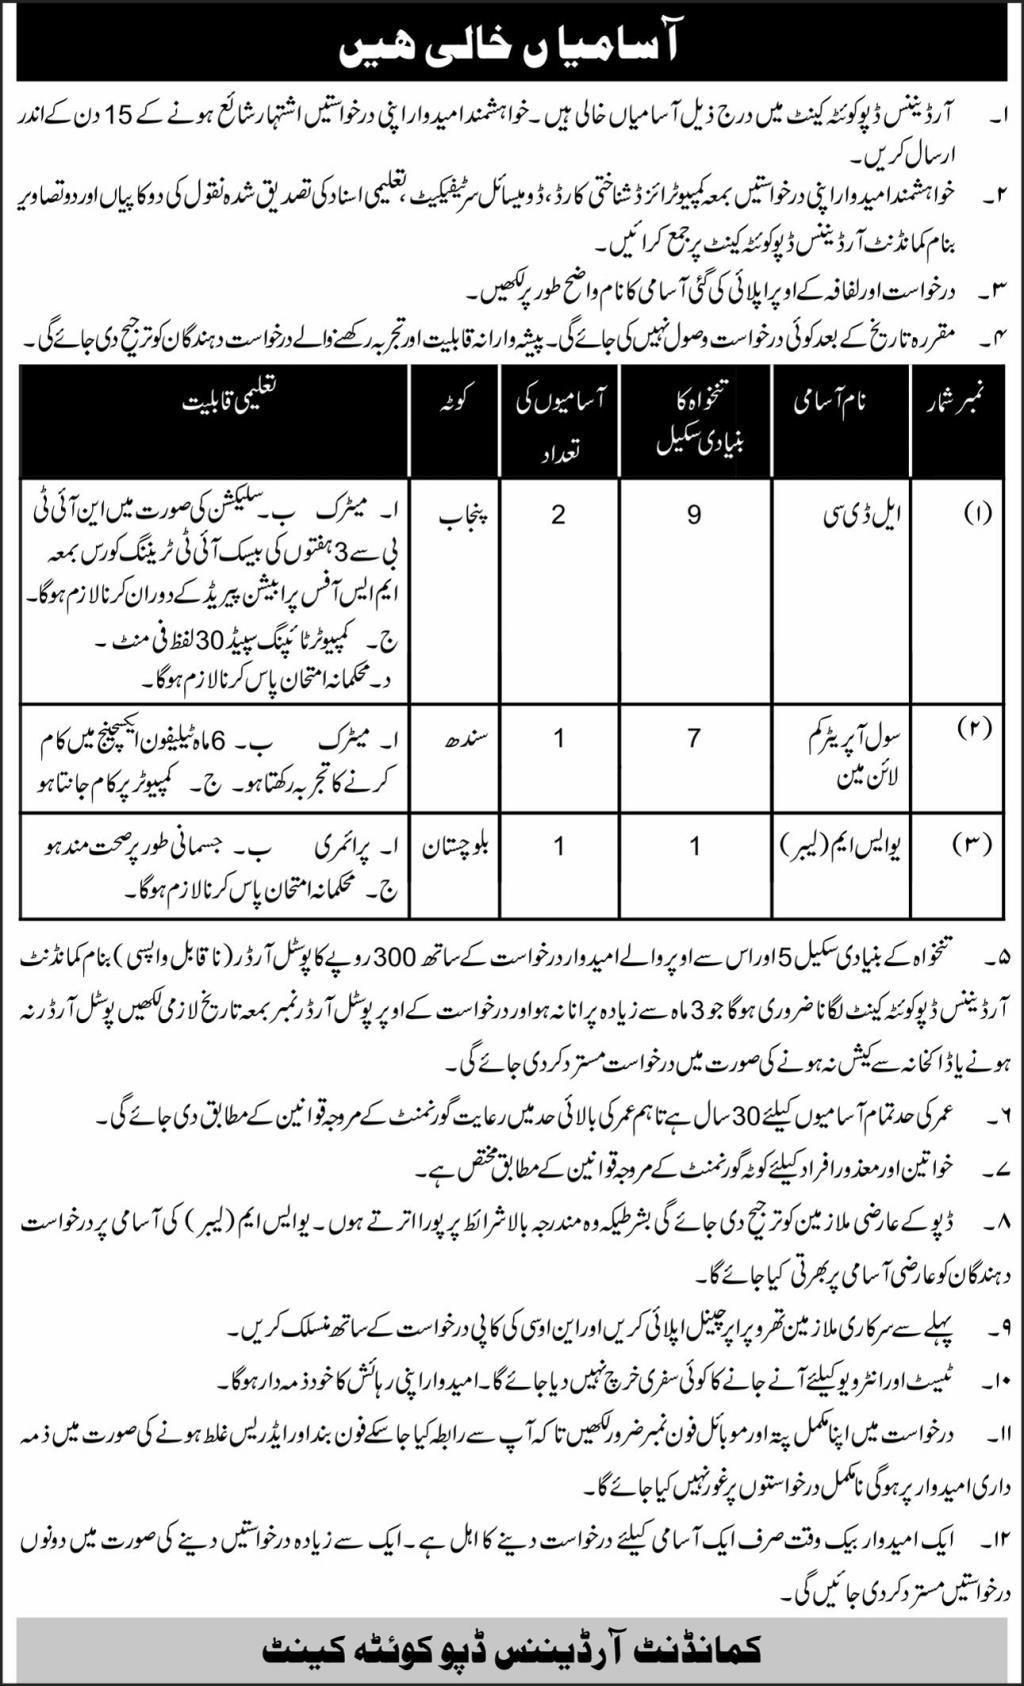 Managementy Jobs in Ordnance Depot Quetta